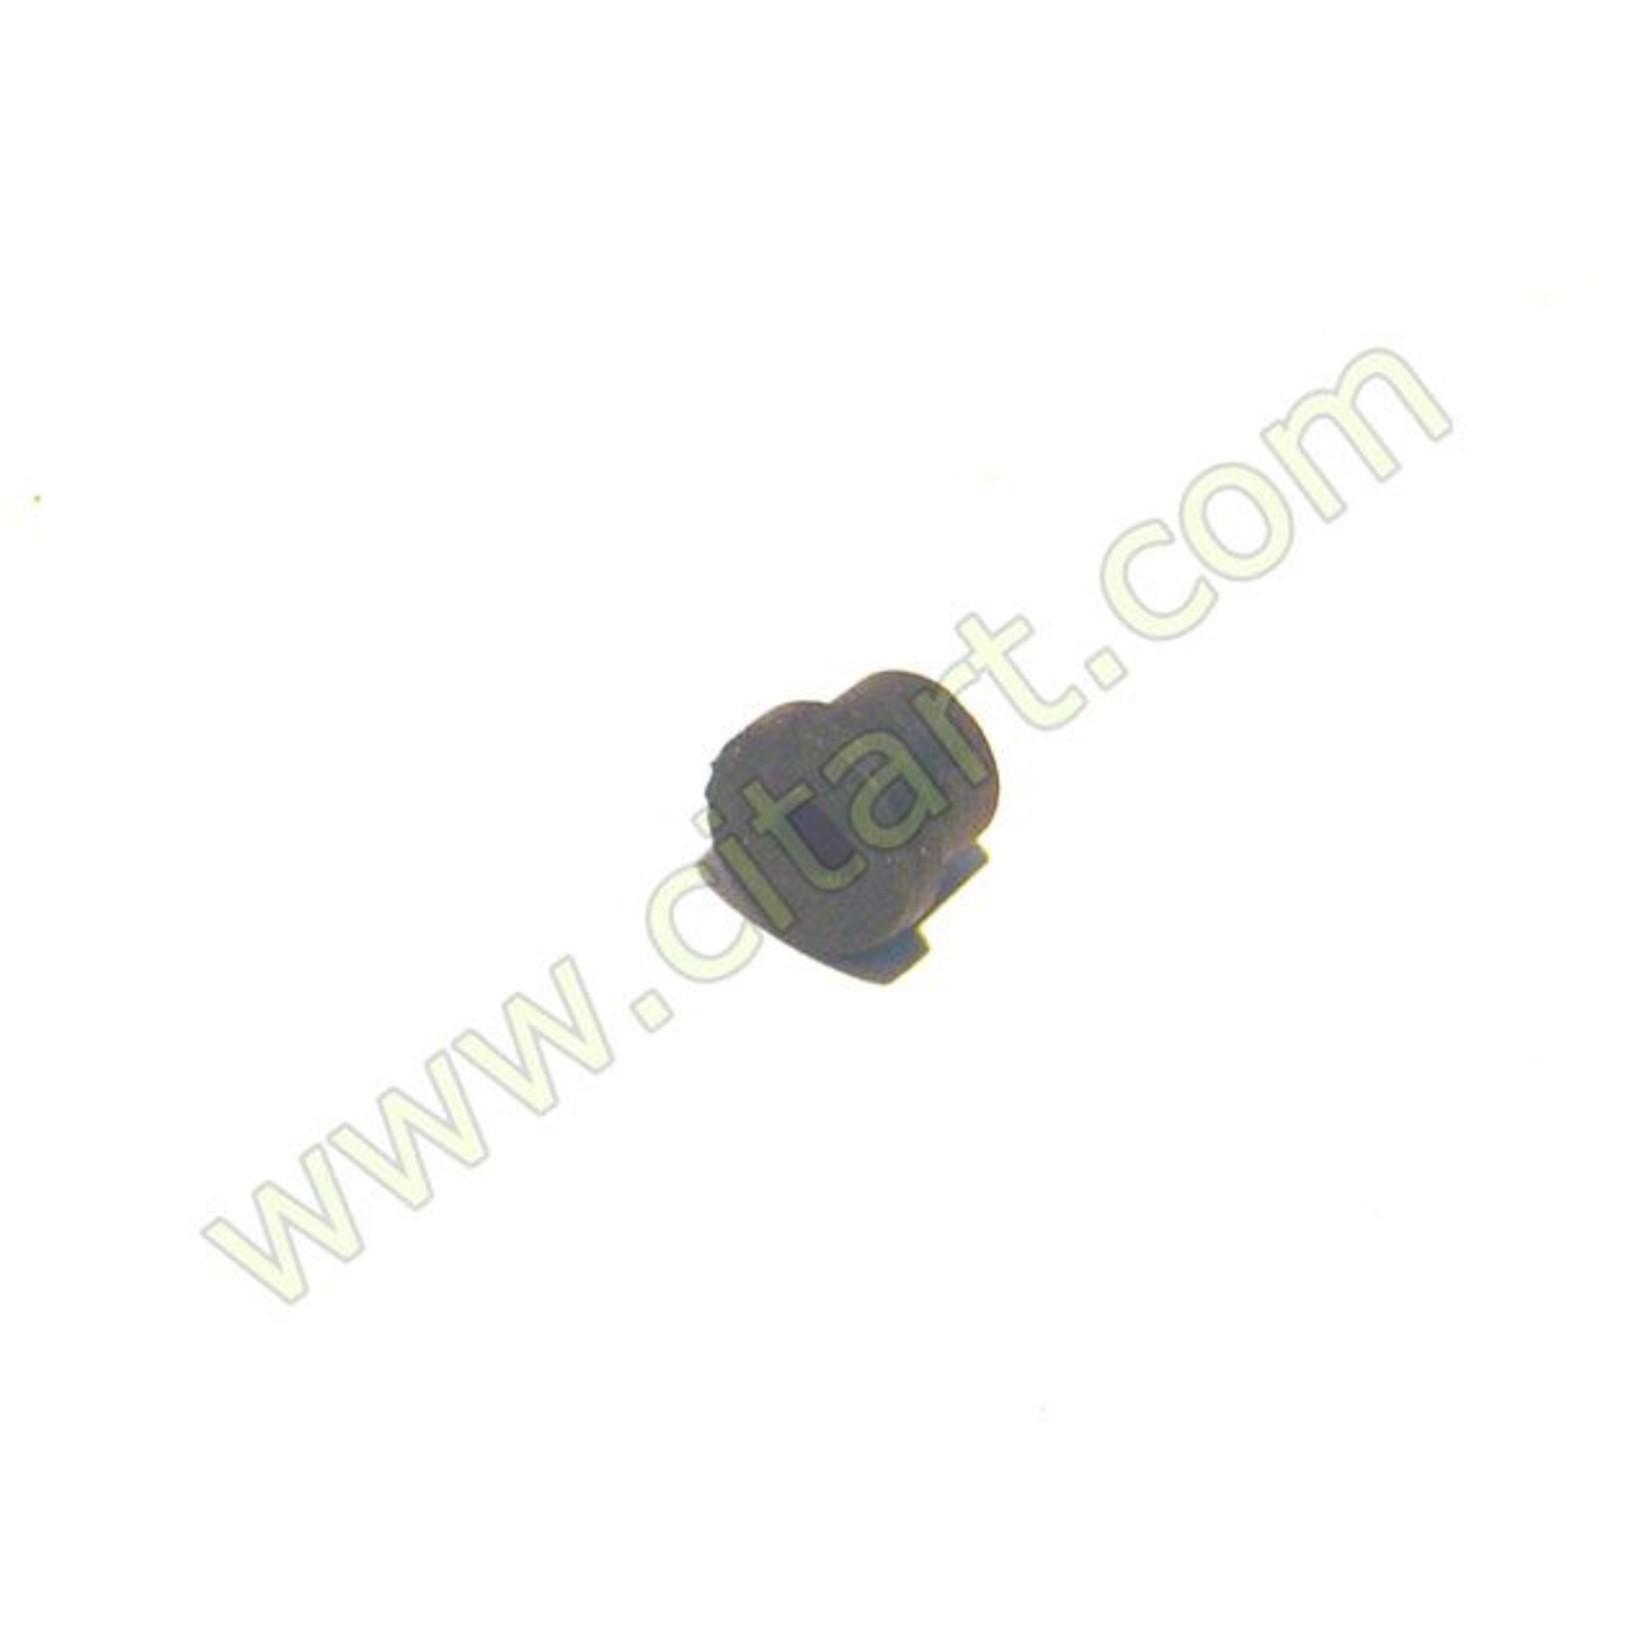 Stofkap ontluchtnippel centrifugaalregelaar / remmen Nr Org: 5405105